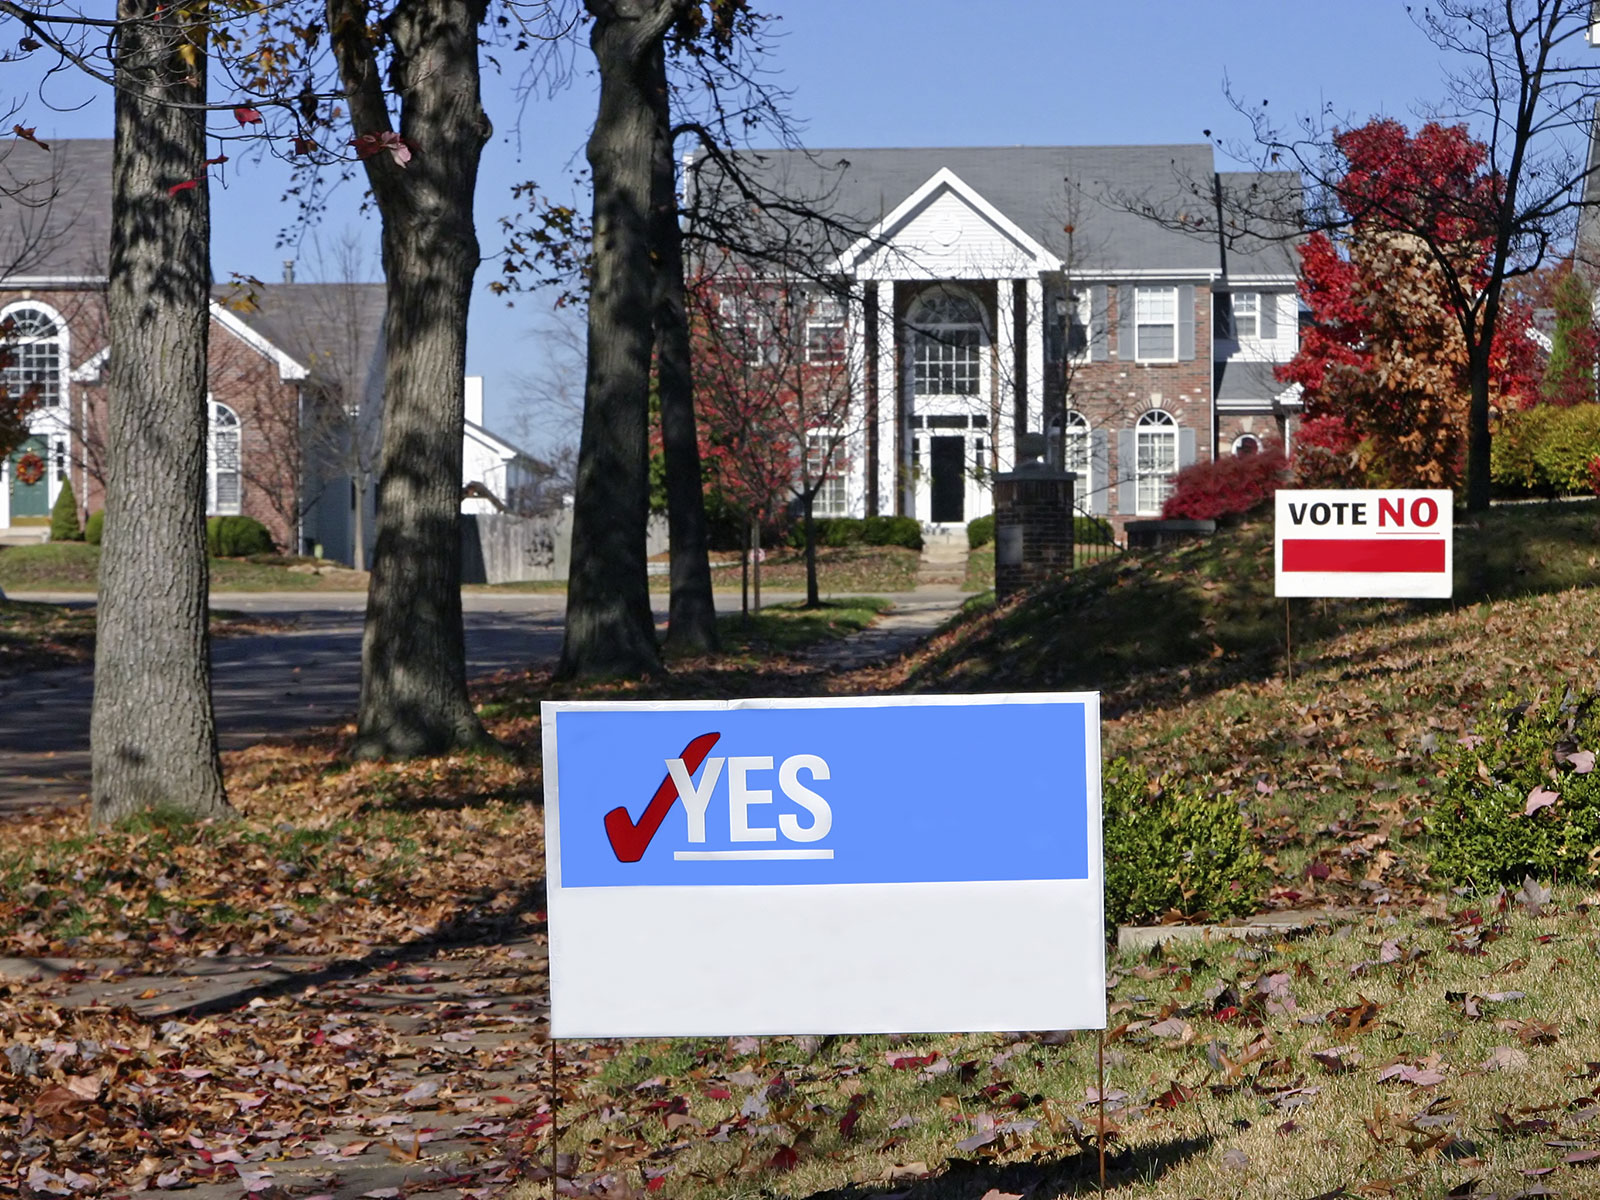 Political yard sign vote